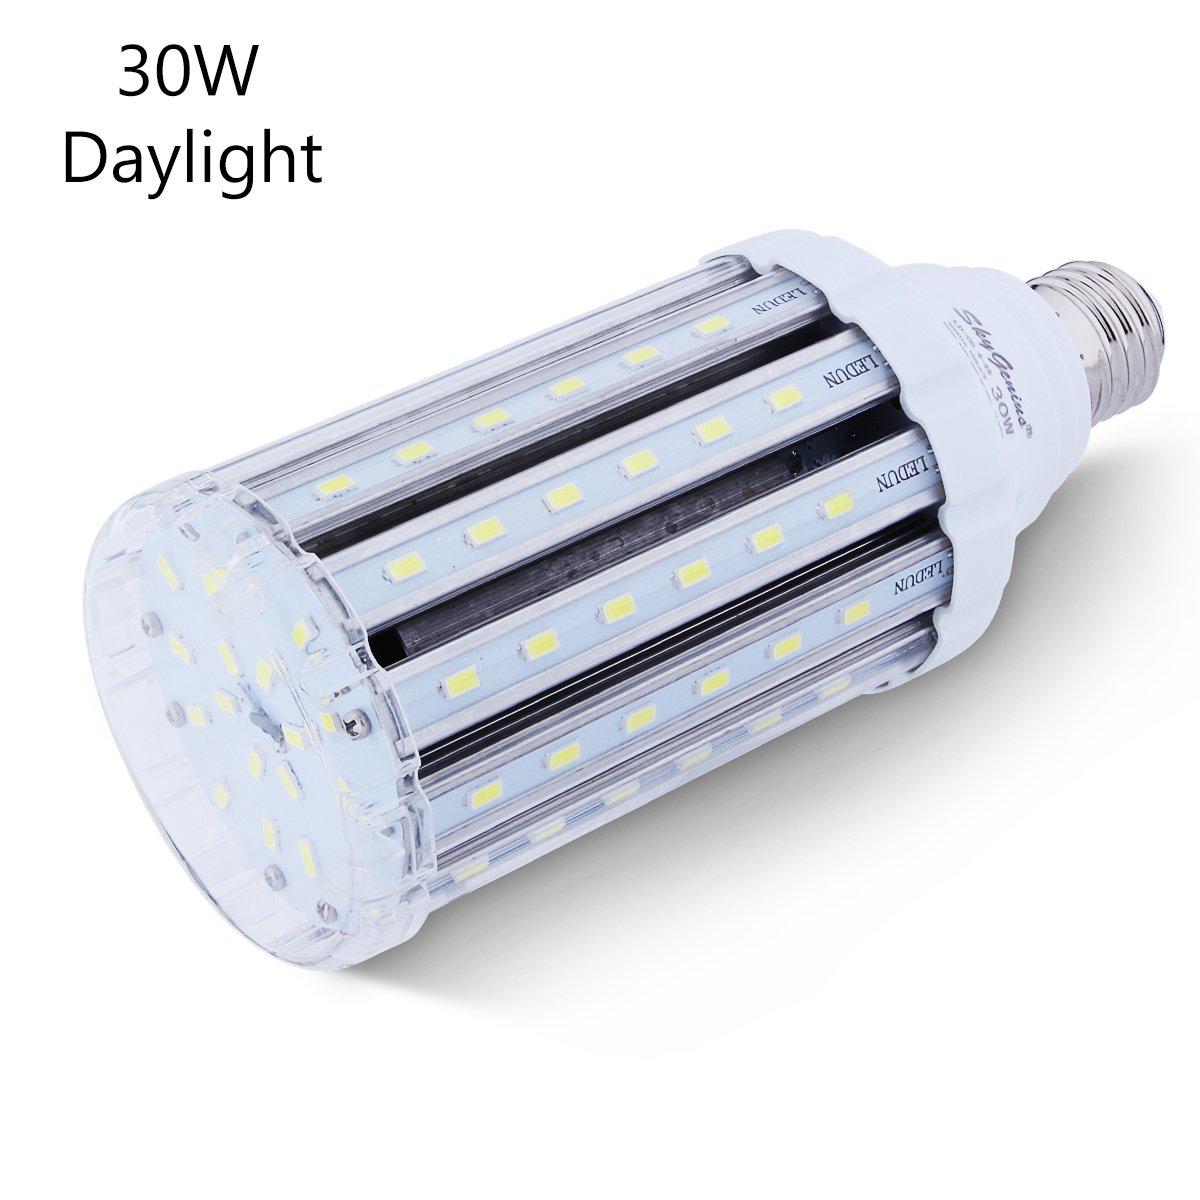 30W Daylight LED Corn Light Bulb For Indoor Outdoor Large Area   E26 Socket  3000Lm 6500K, For Home Street Lamp Post Lighting Garage Factory Warehouse  High ...